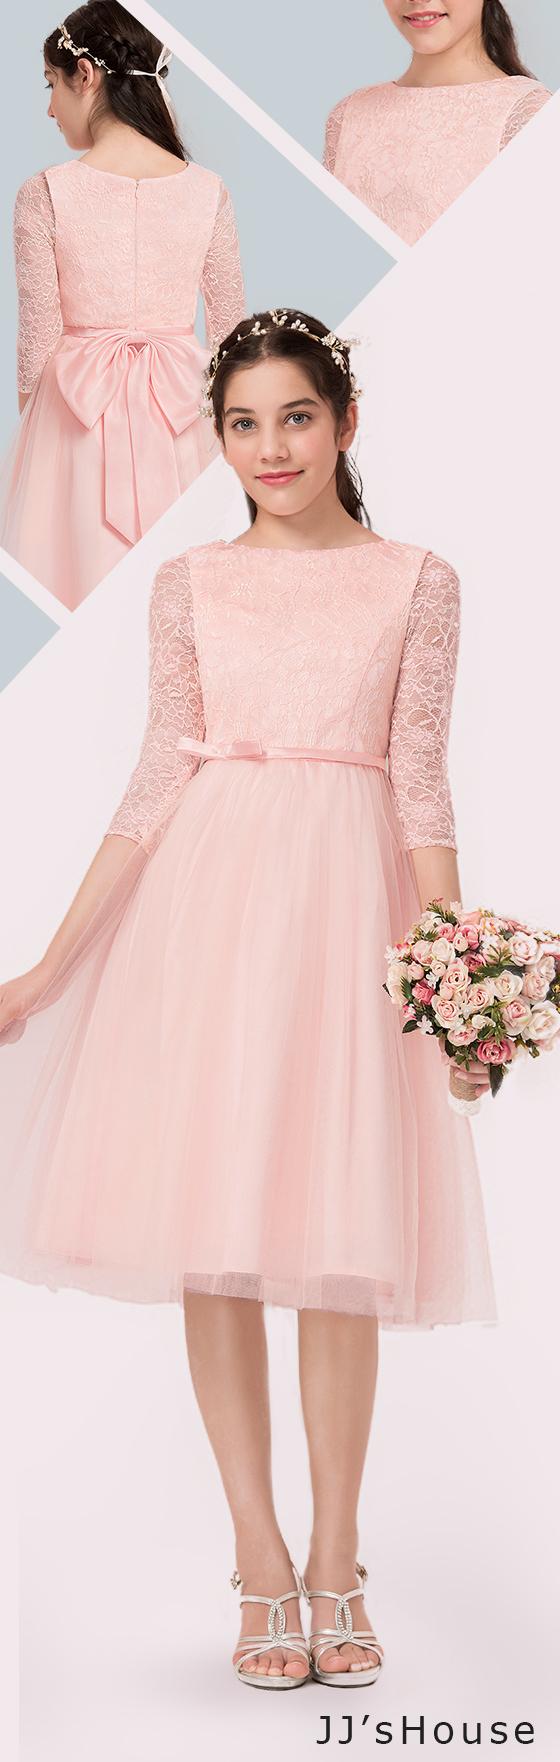 A-Line/Princess Scoop Neck Knee-Length Tulle Junior Bridesmaid Dress ...